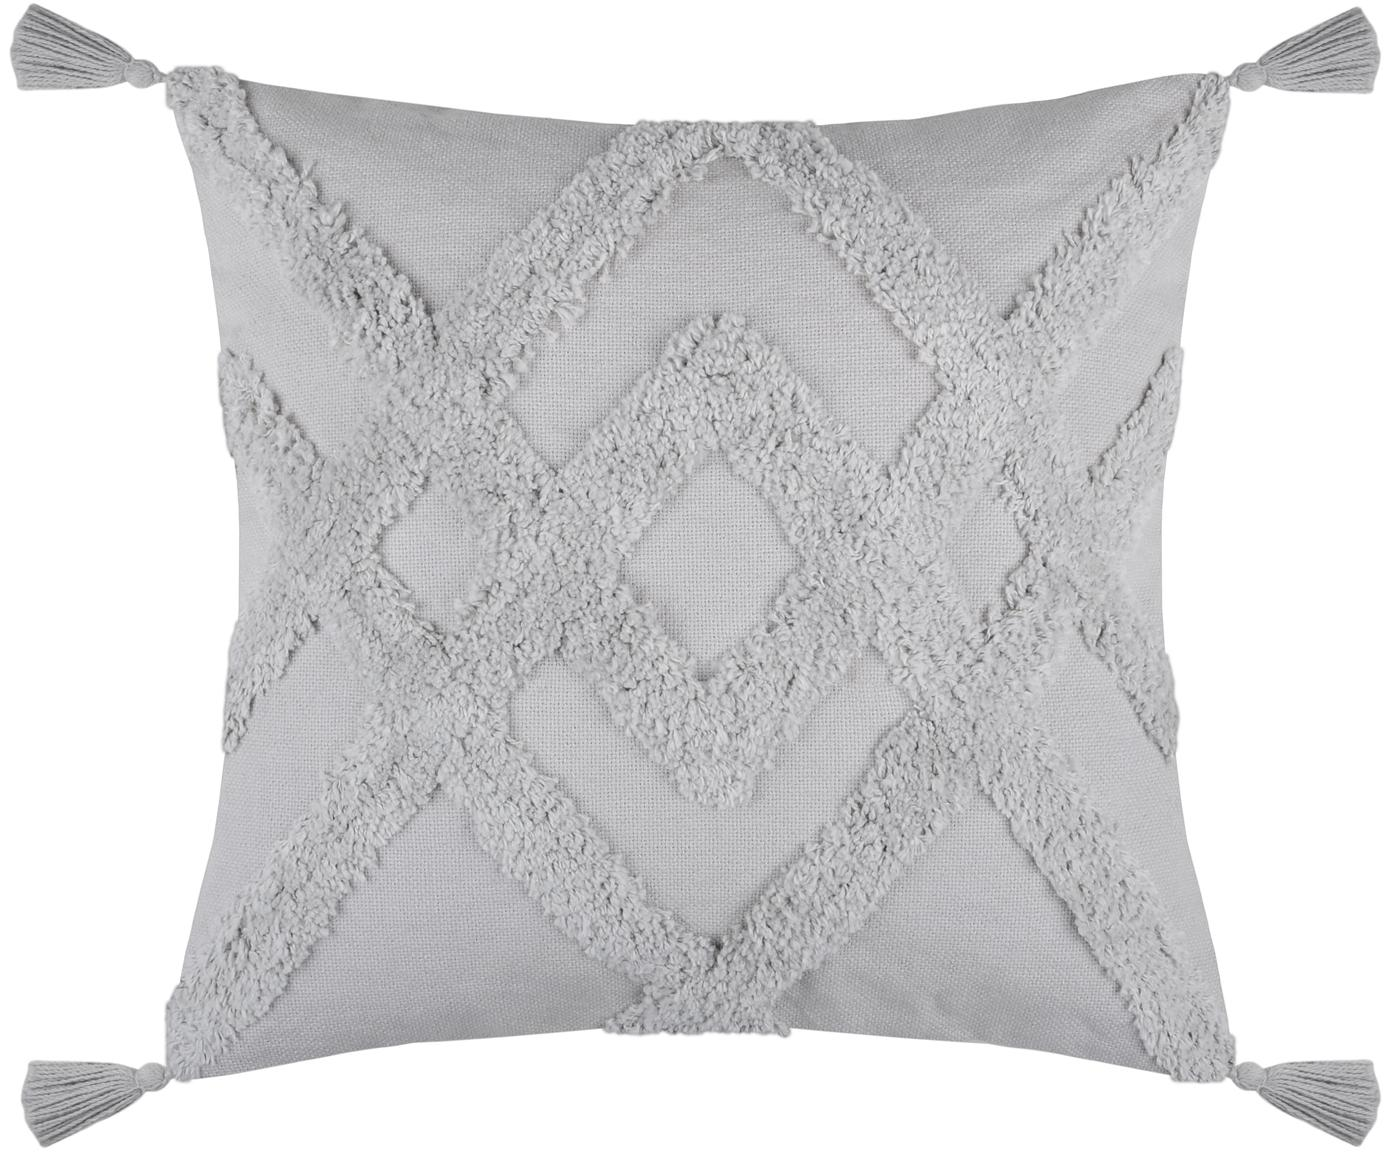 Cuscino con imbottitura Tiksi, Rivestimento: cotone, Grigio, Larg. 40 x Lung. 40 cm